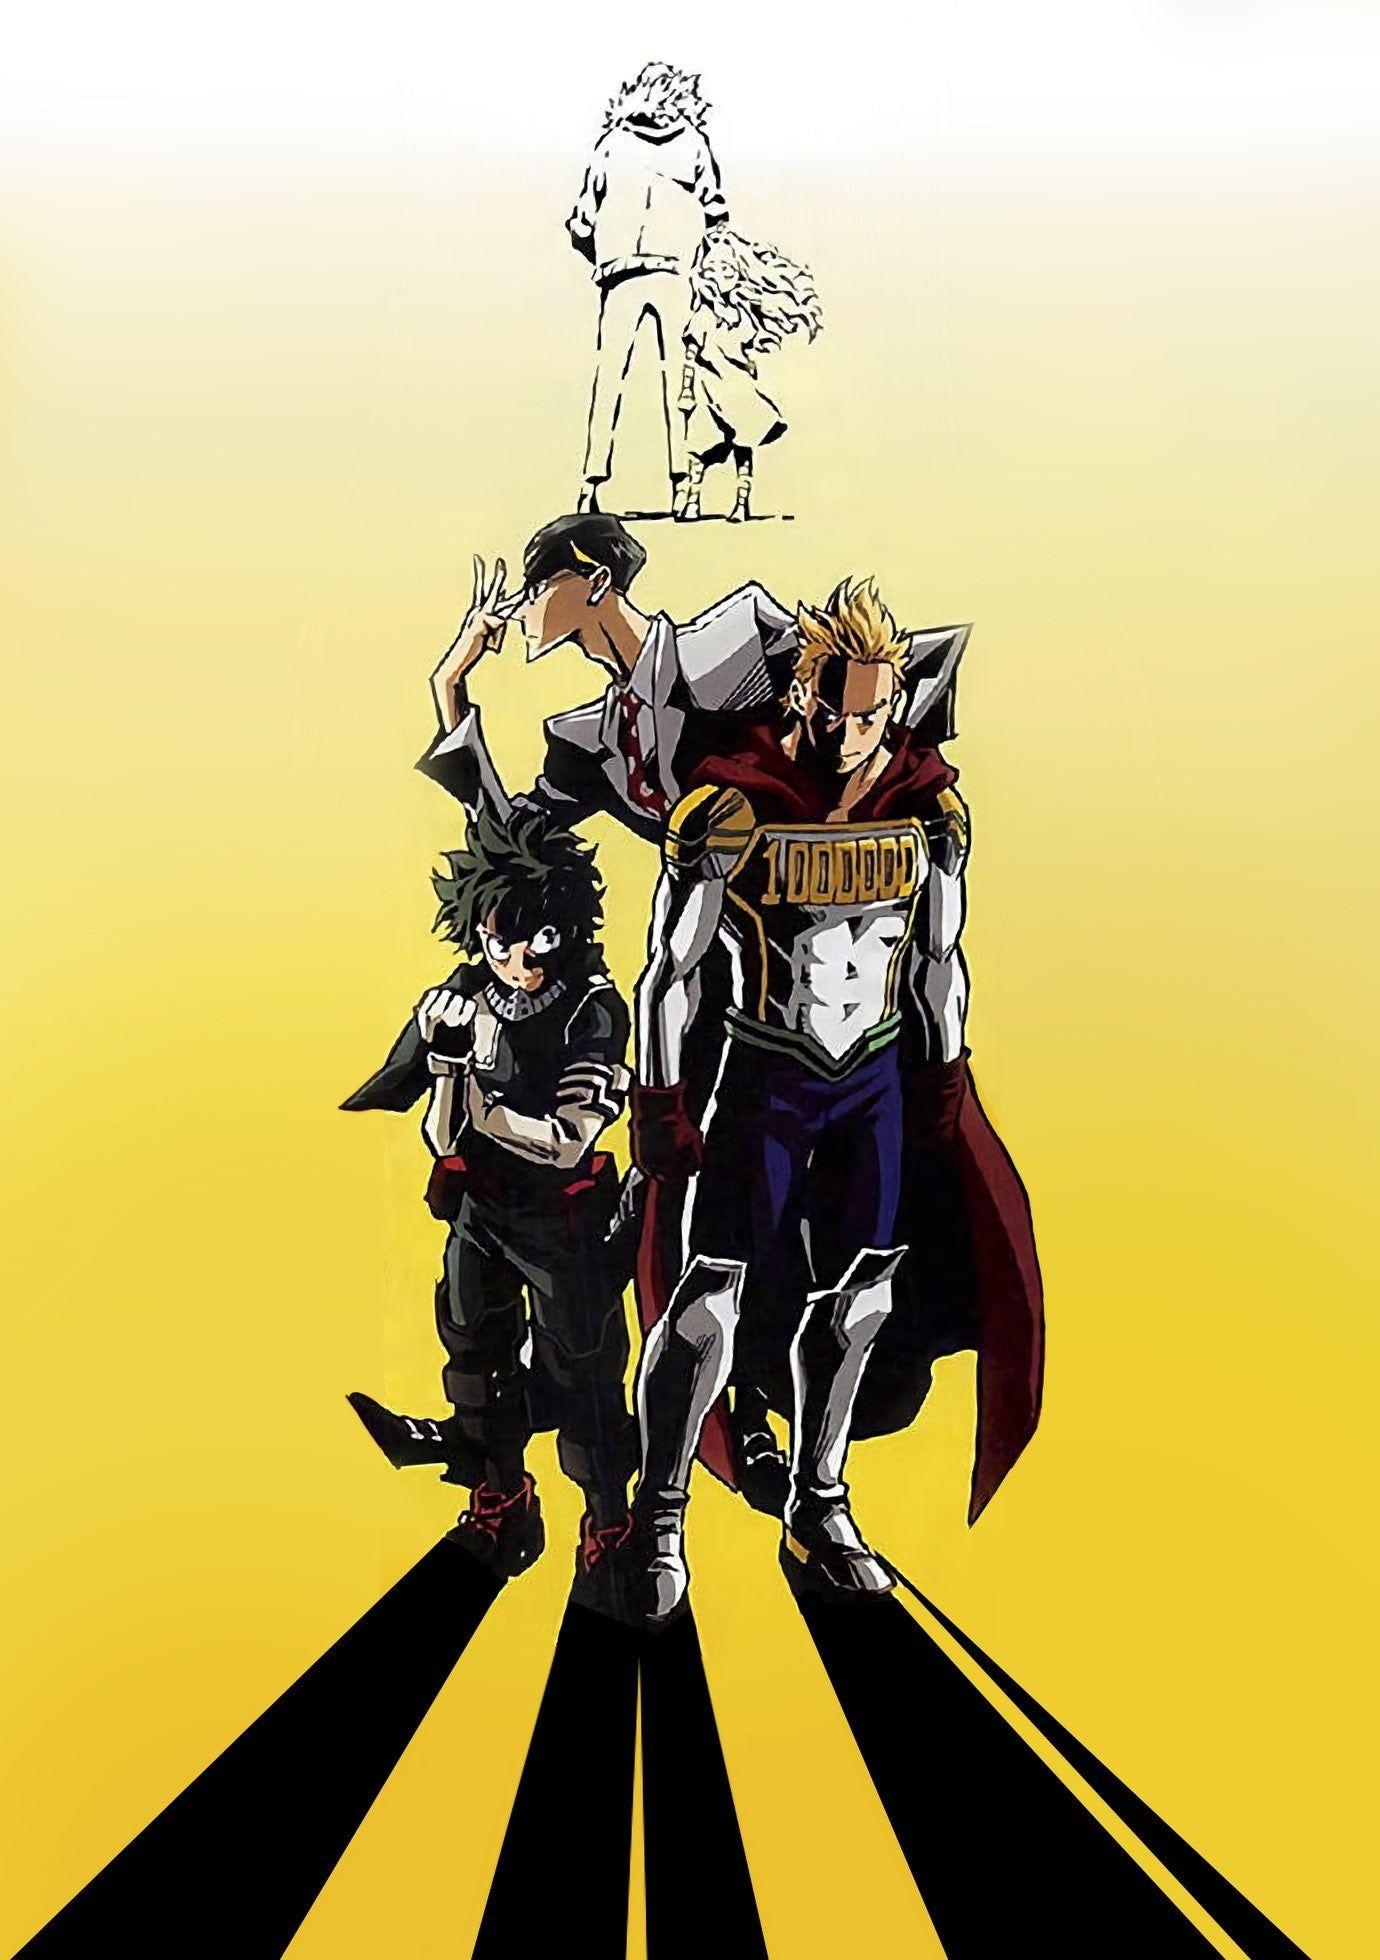 Boku No Hero Academia Season 4 Wallpaper Animasi Keselamatan Anak Lirik Lagu